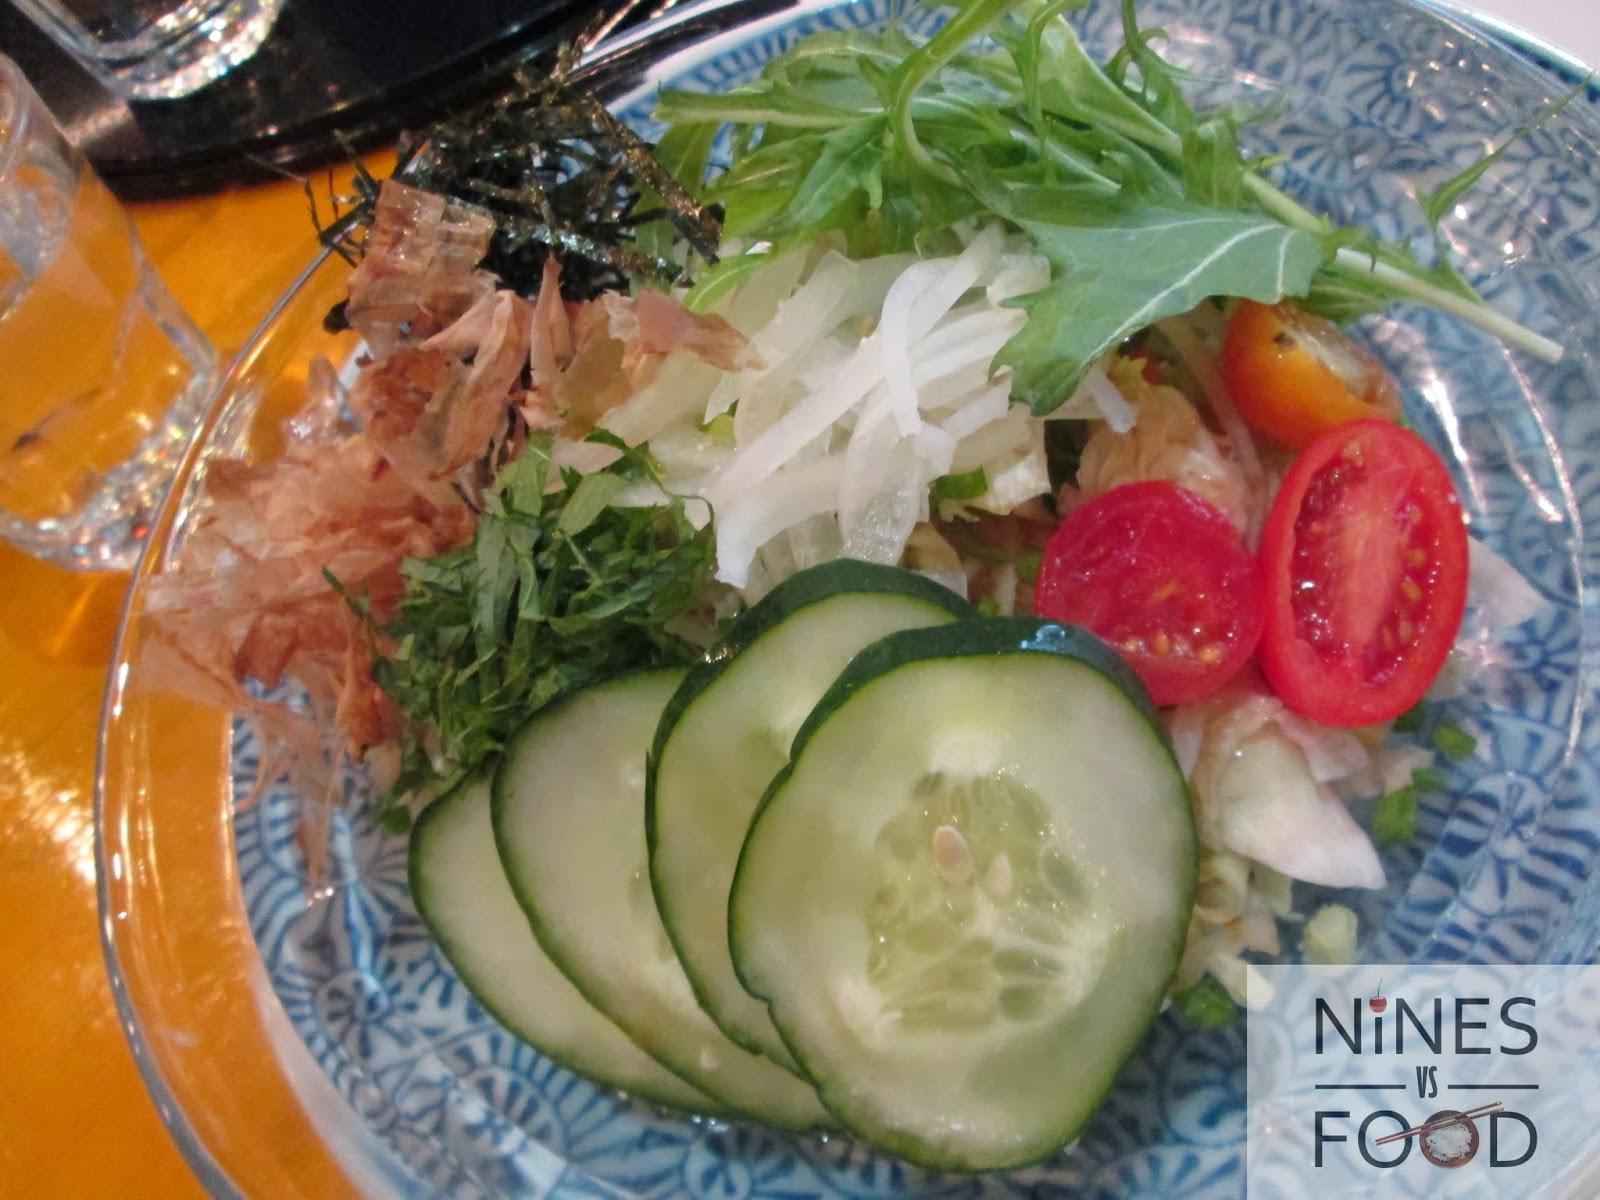 Nines vs. Food - Yomenya Goemon Greenbelt 3 - 7.jpg